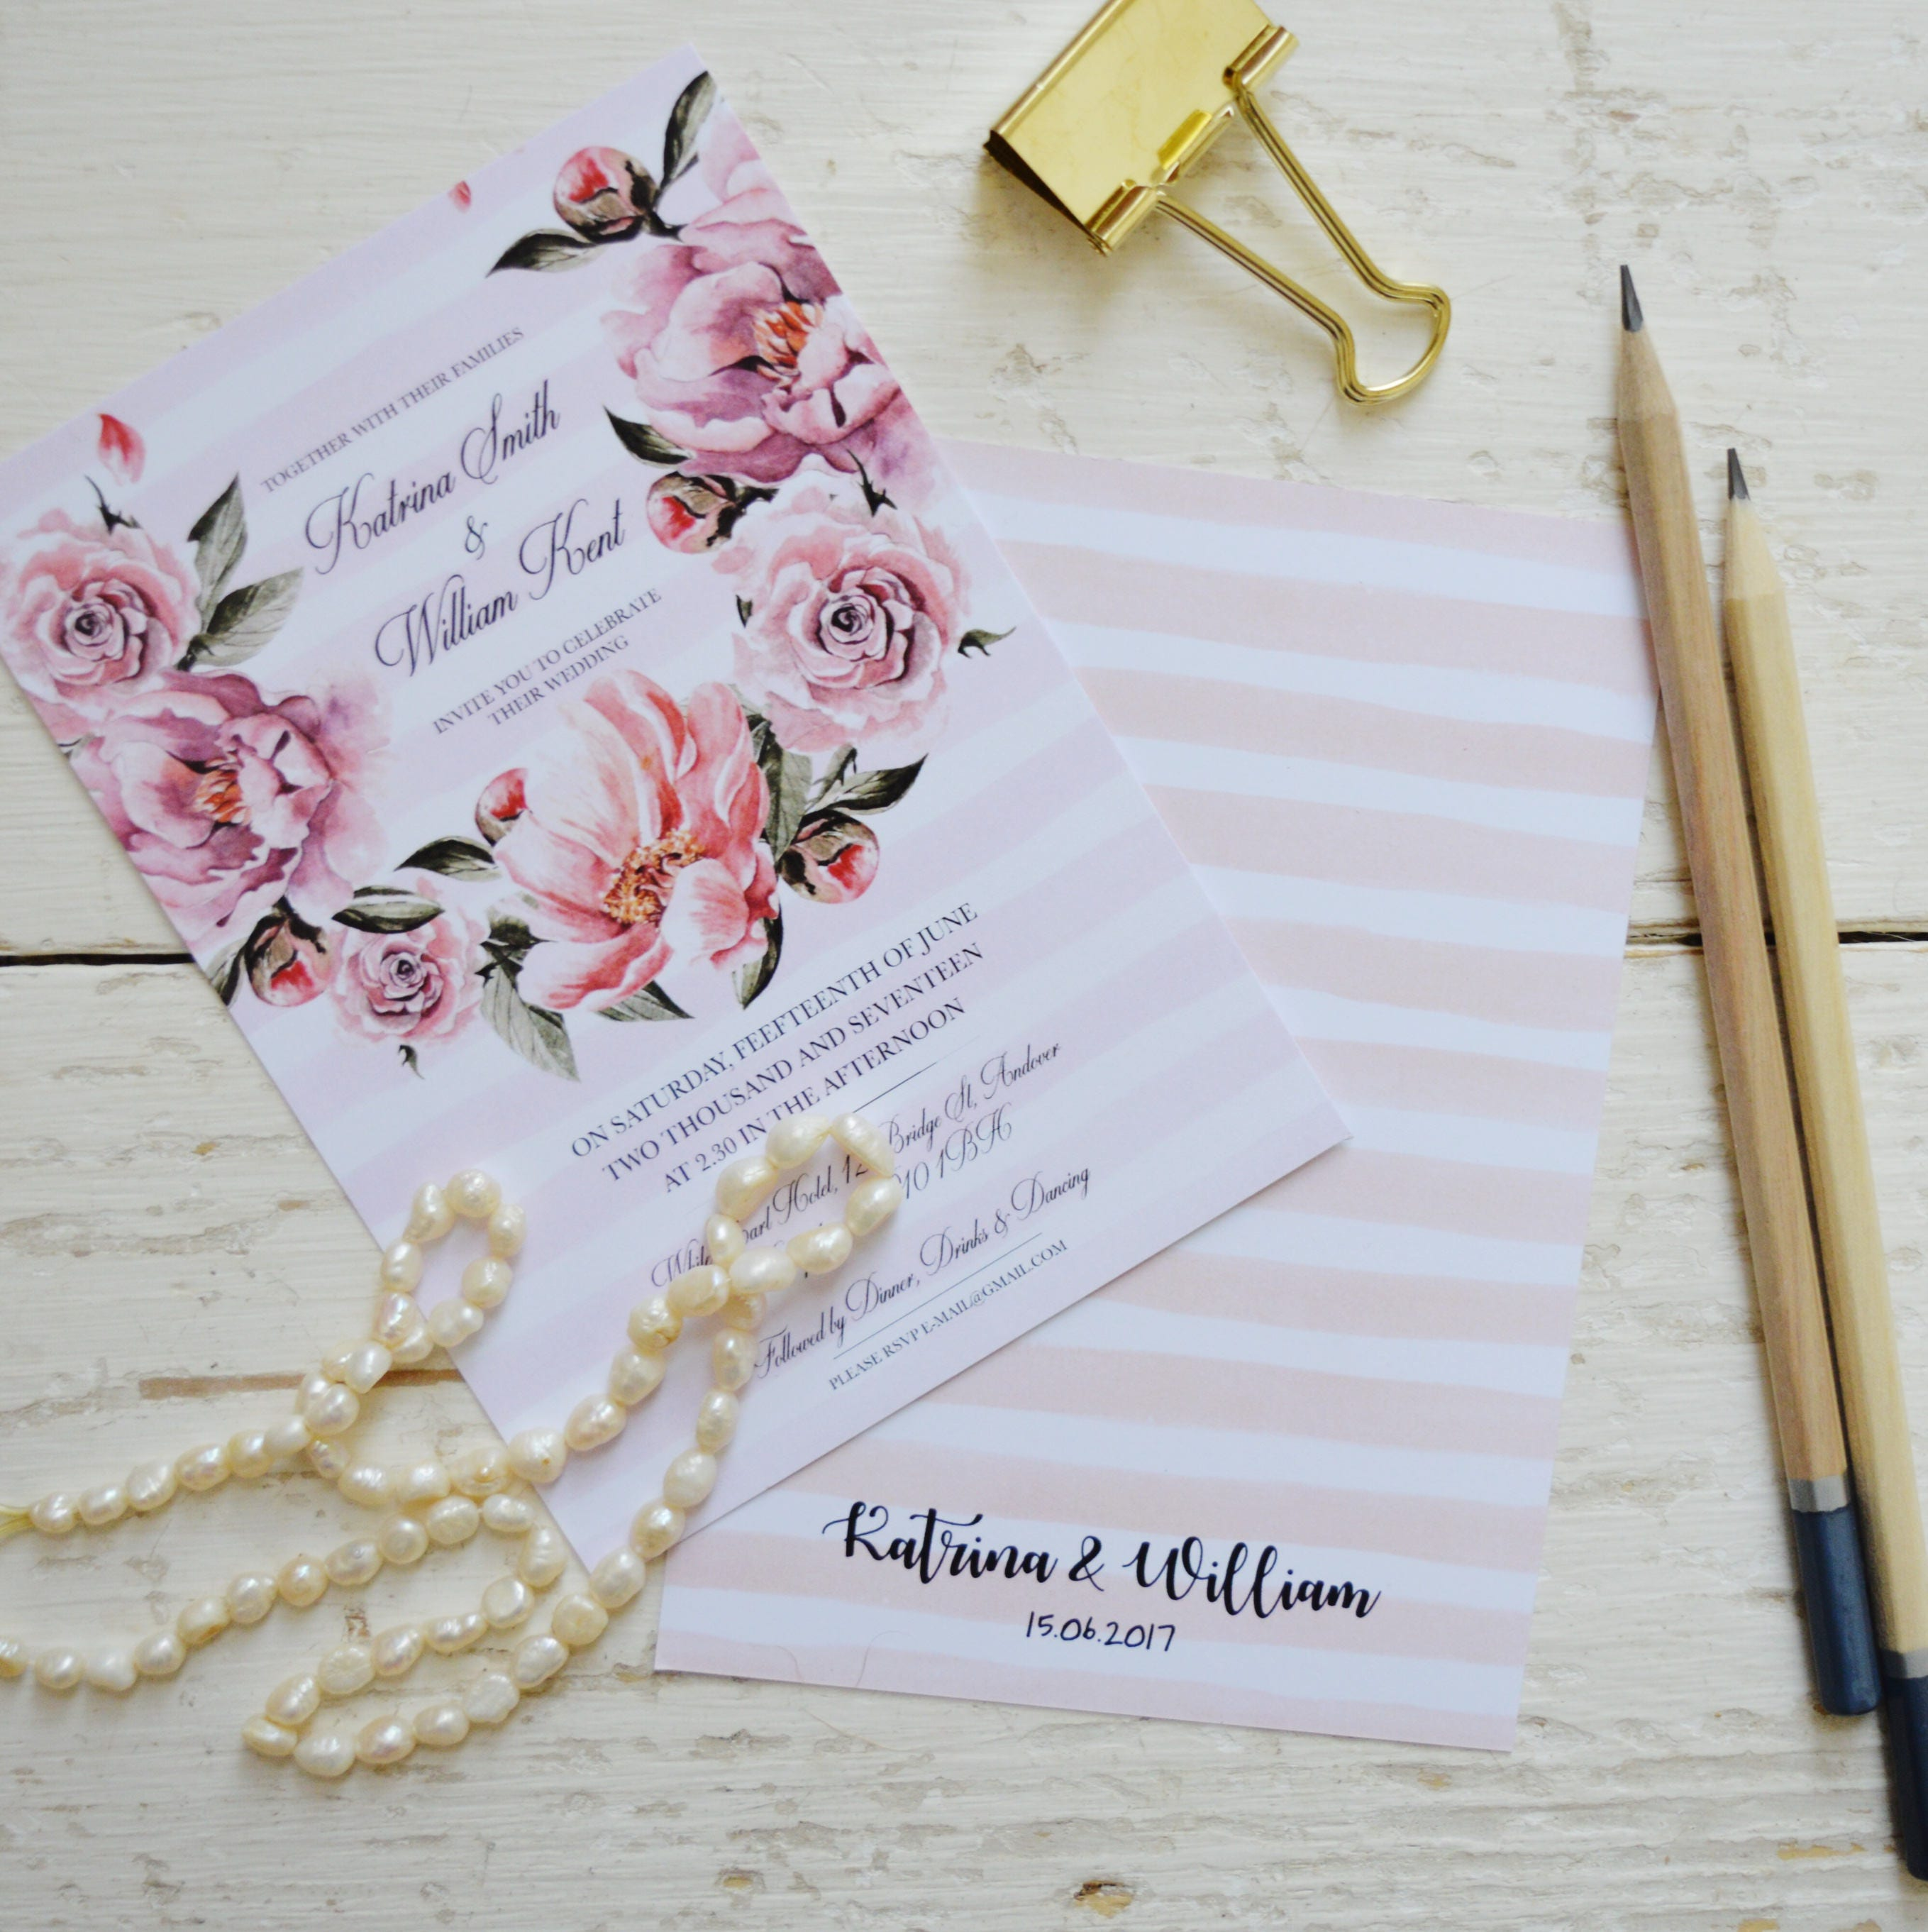 Bohemian Wedding Invitation Printable Boho Floral Templates Invite Chic Invites A5